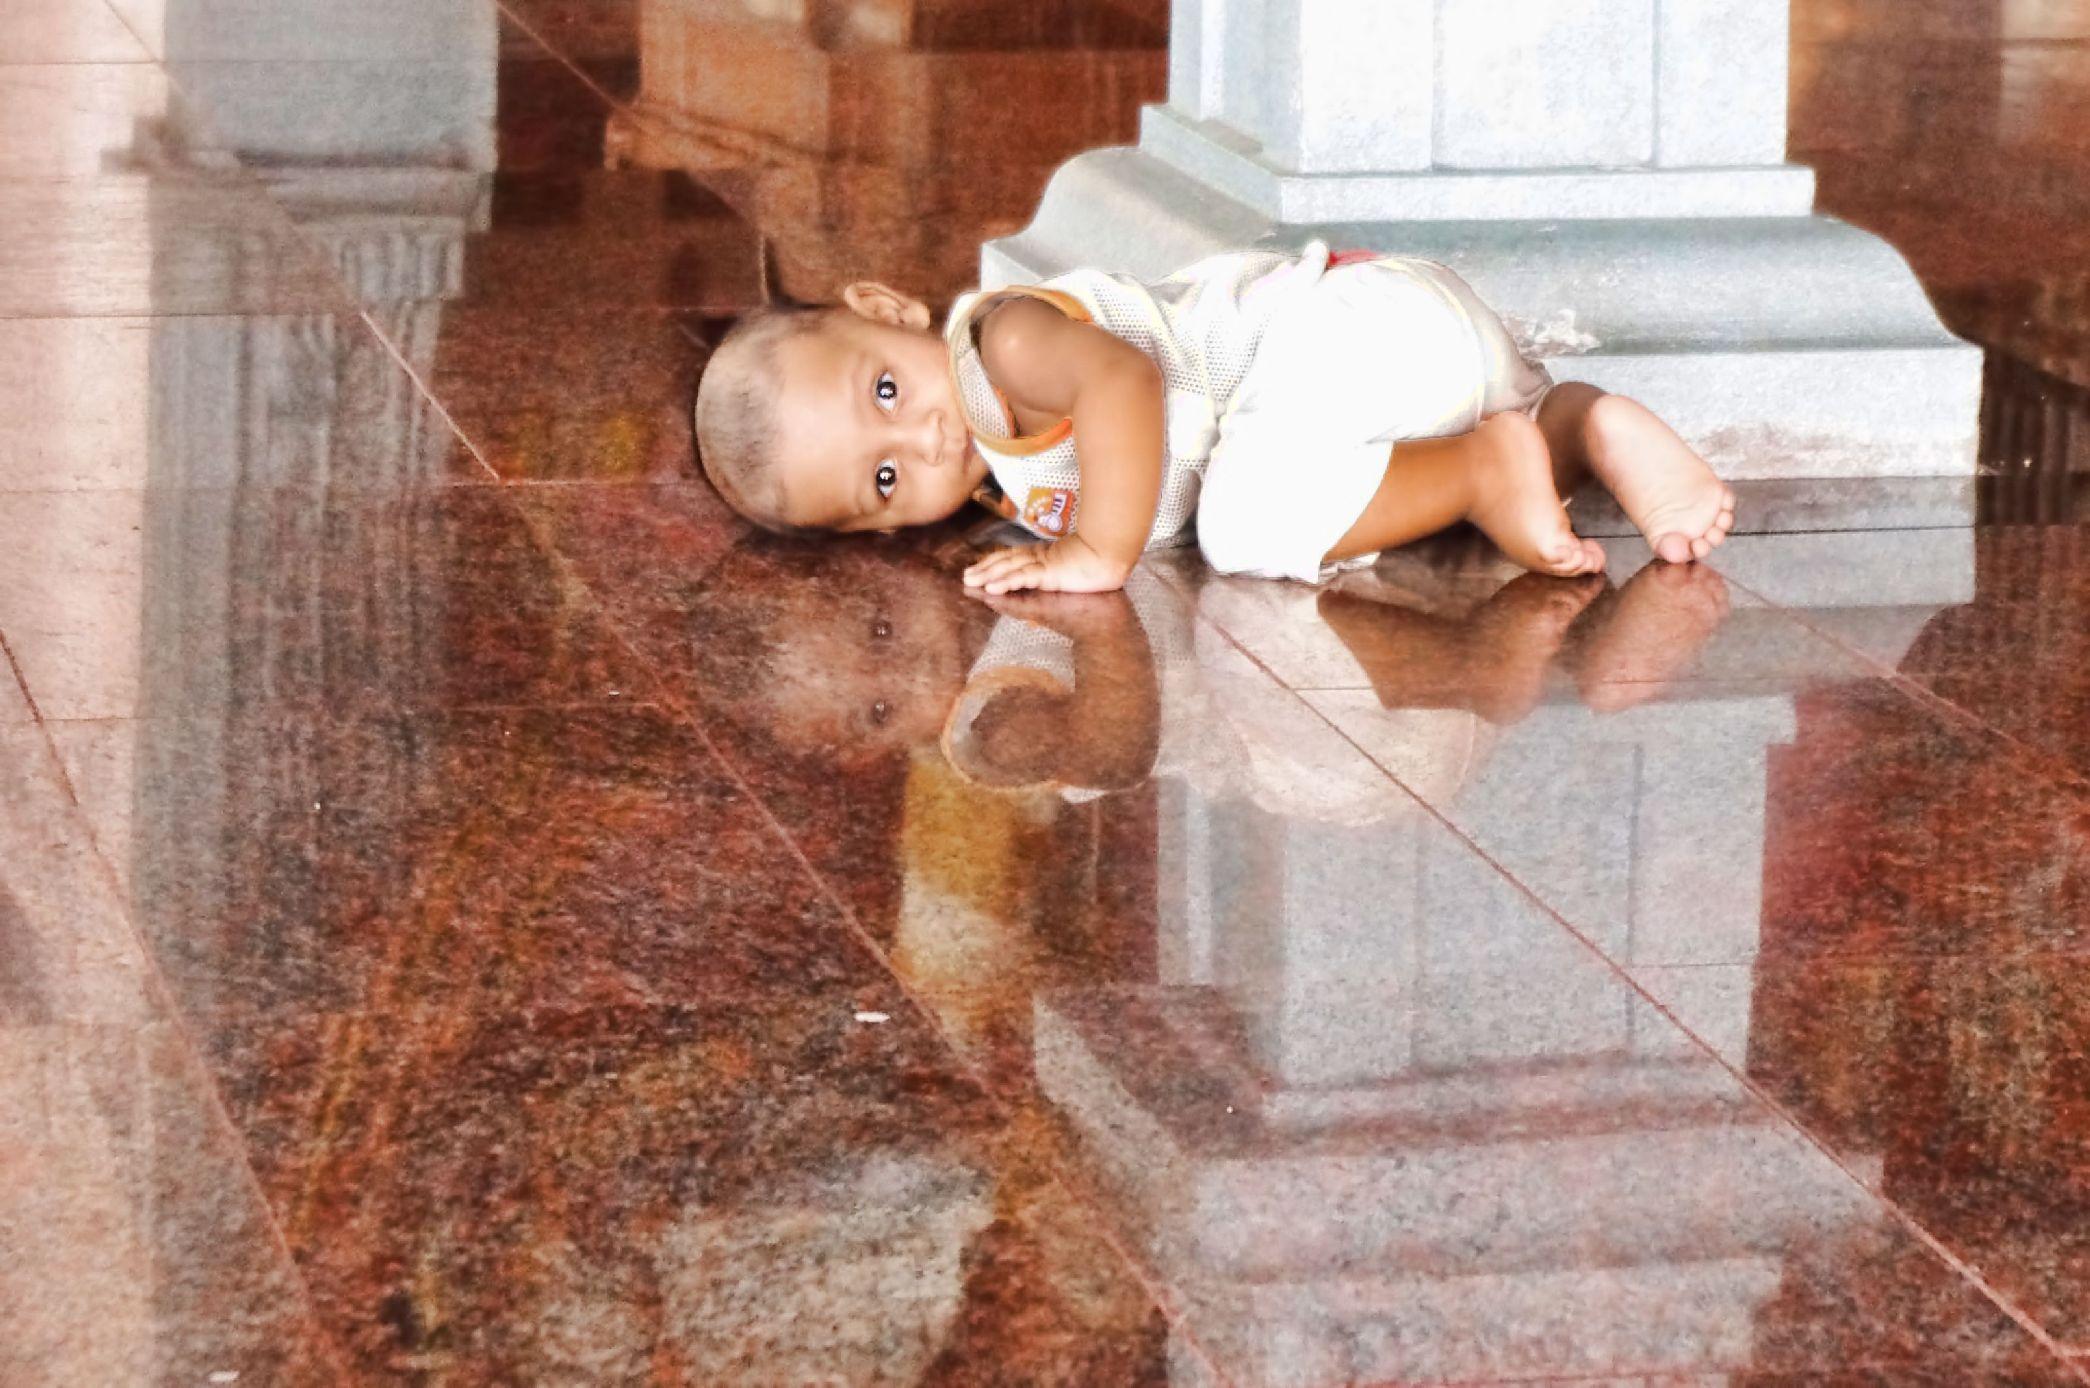 child on temple floot ashton morris